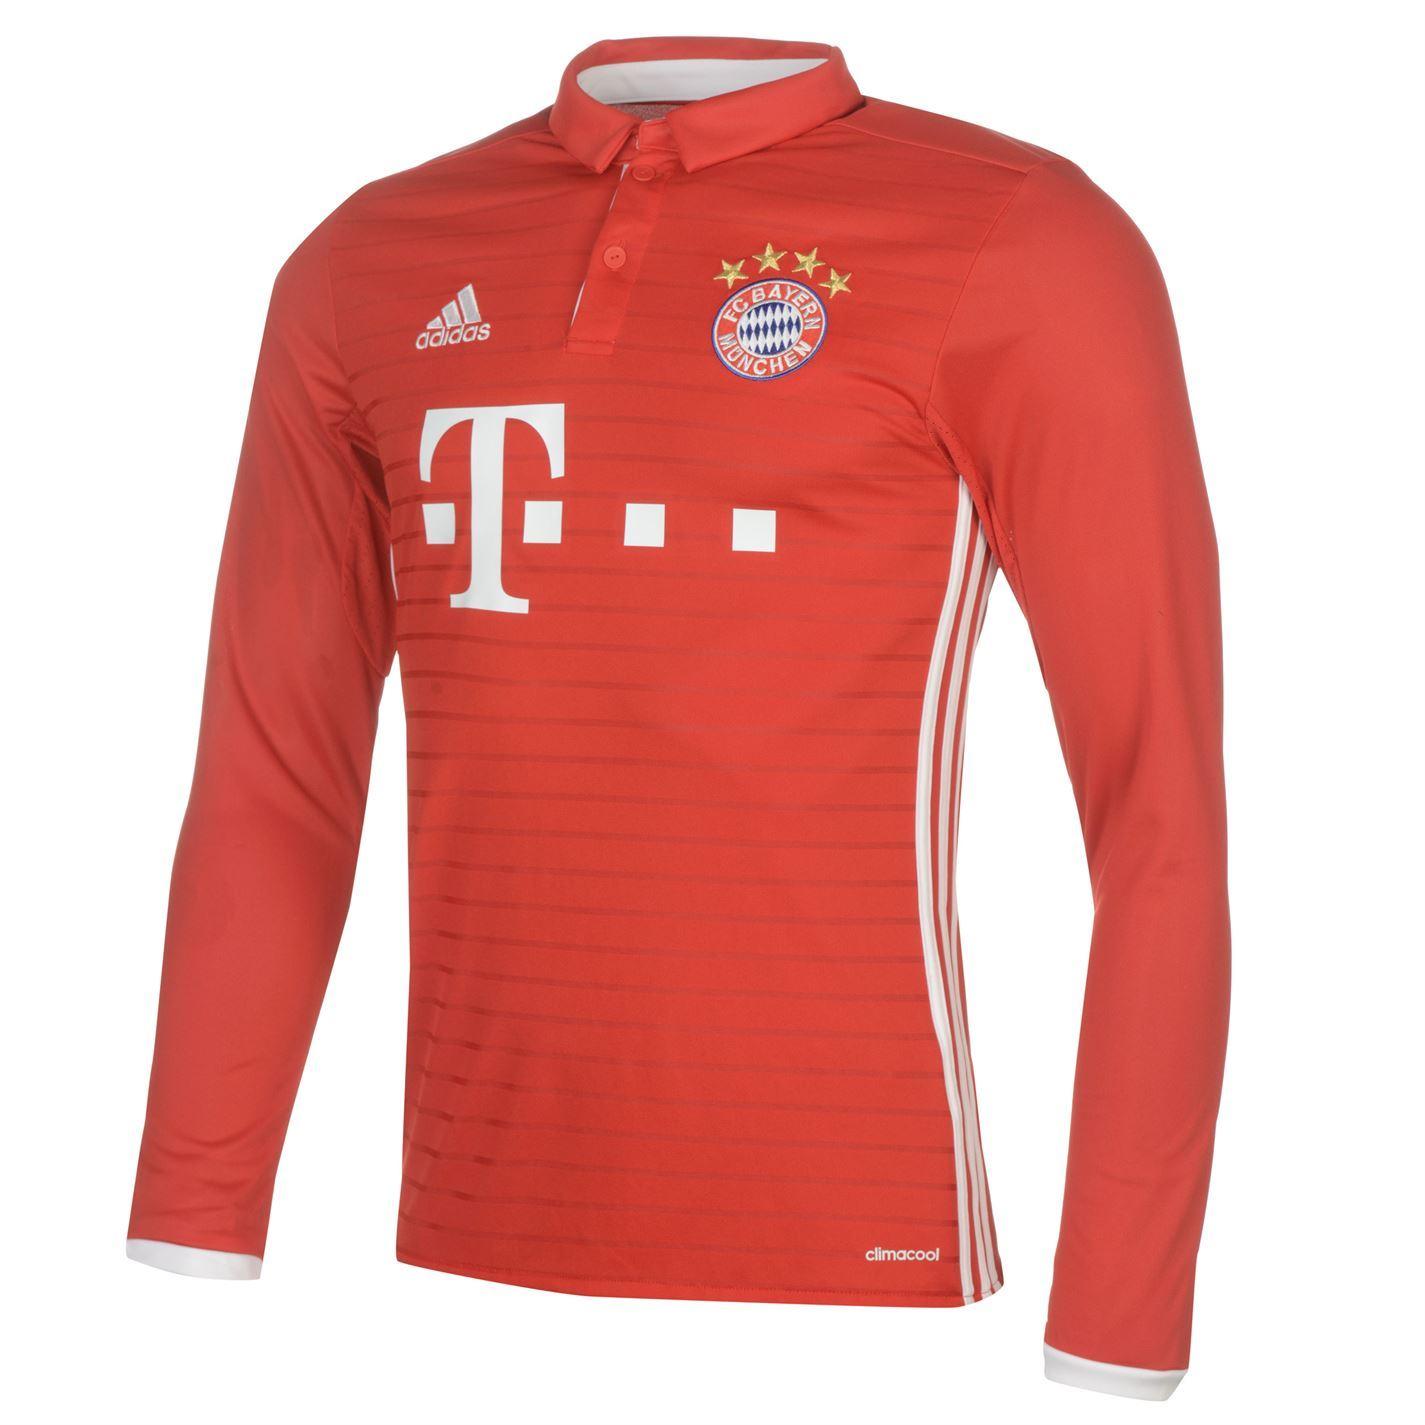 ... adidas Bayern Munich 2016 Home Jersey Mens Red White Football Soccer  Shirt Top 588afaadc76c8